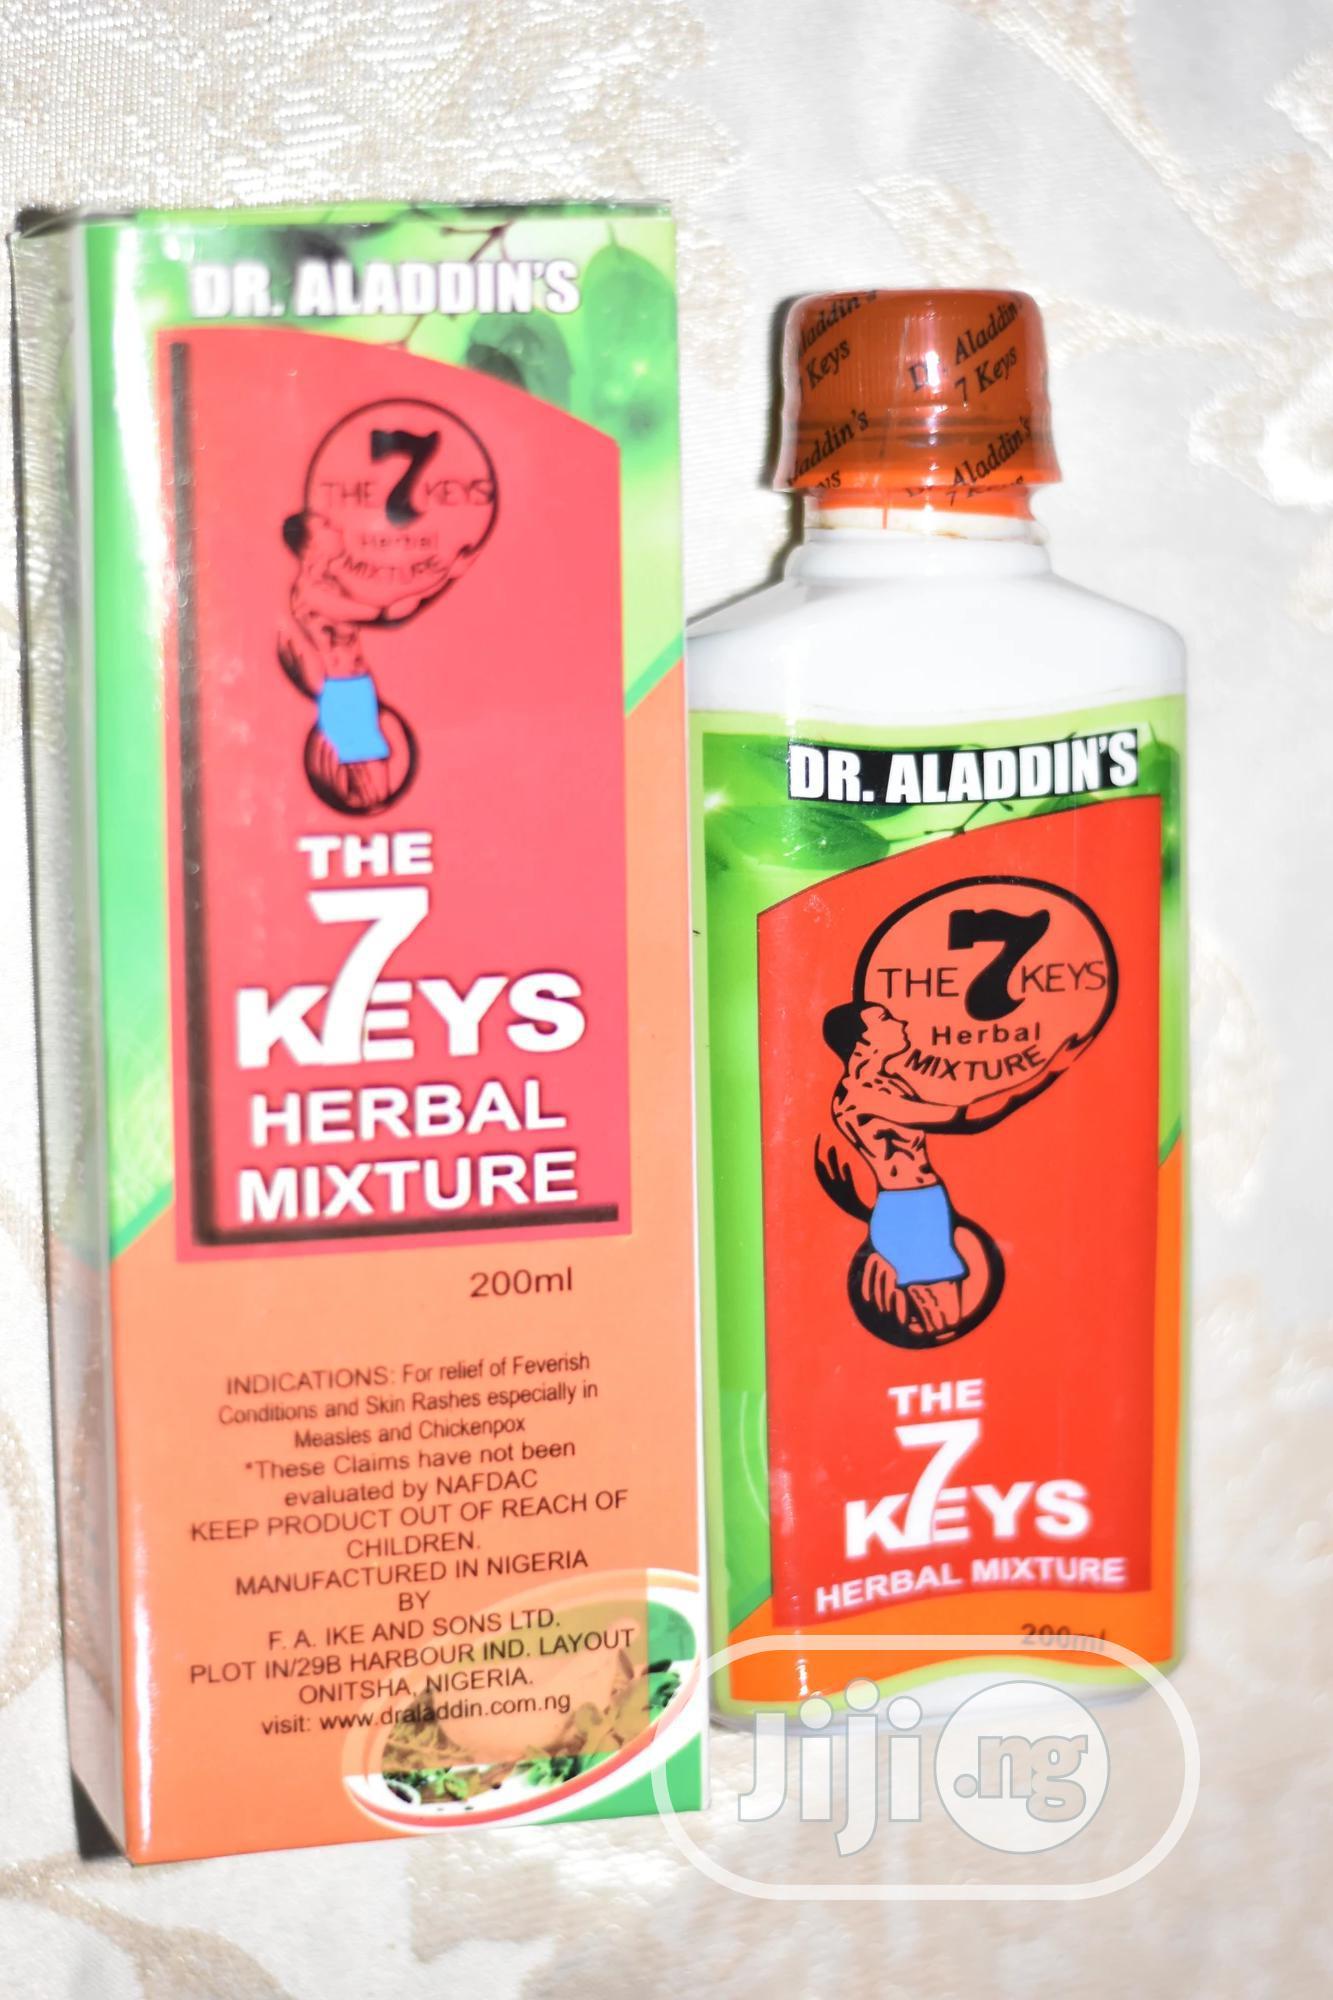 Dr Aladdin's 7 Keys Herbal Mixture